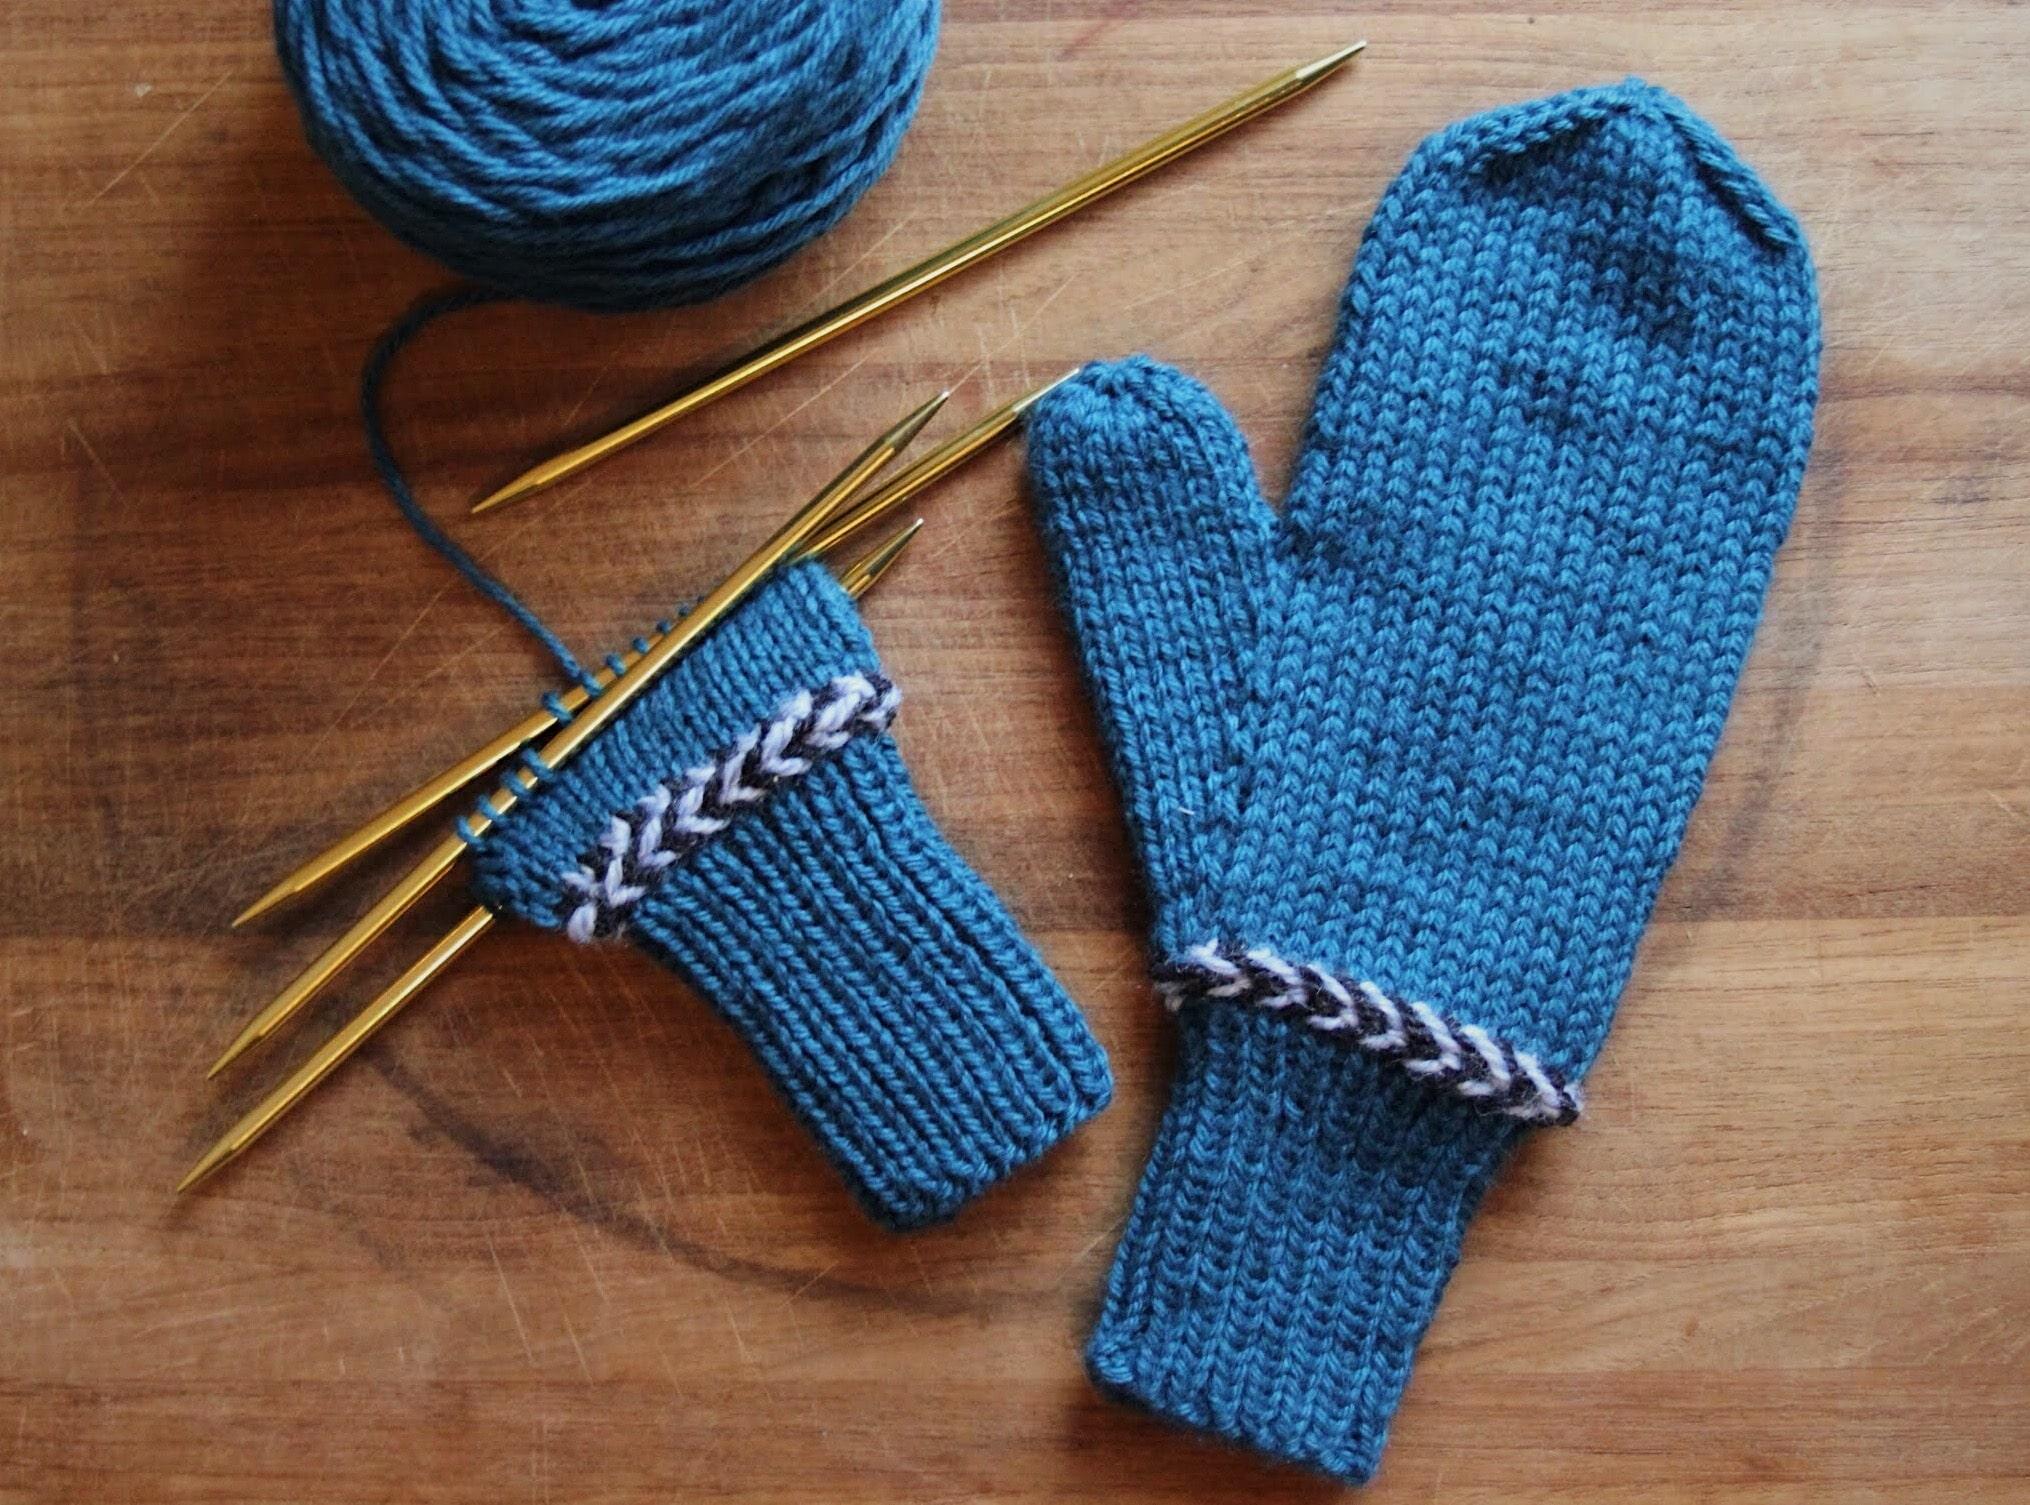 Knitted Mittens Perennial